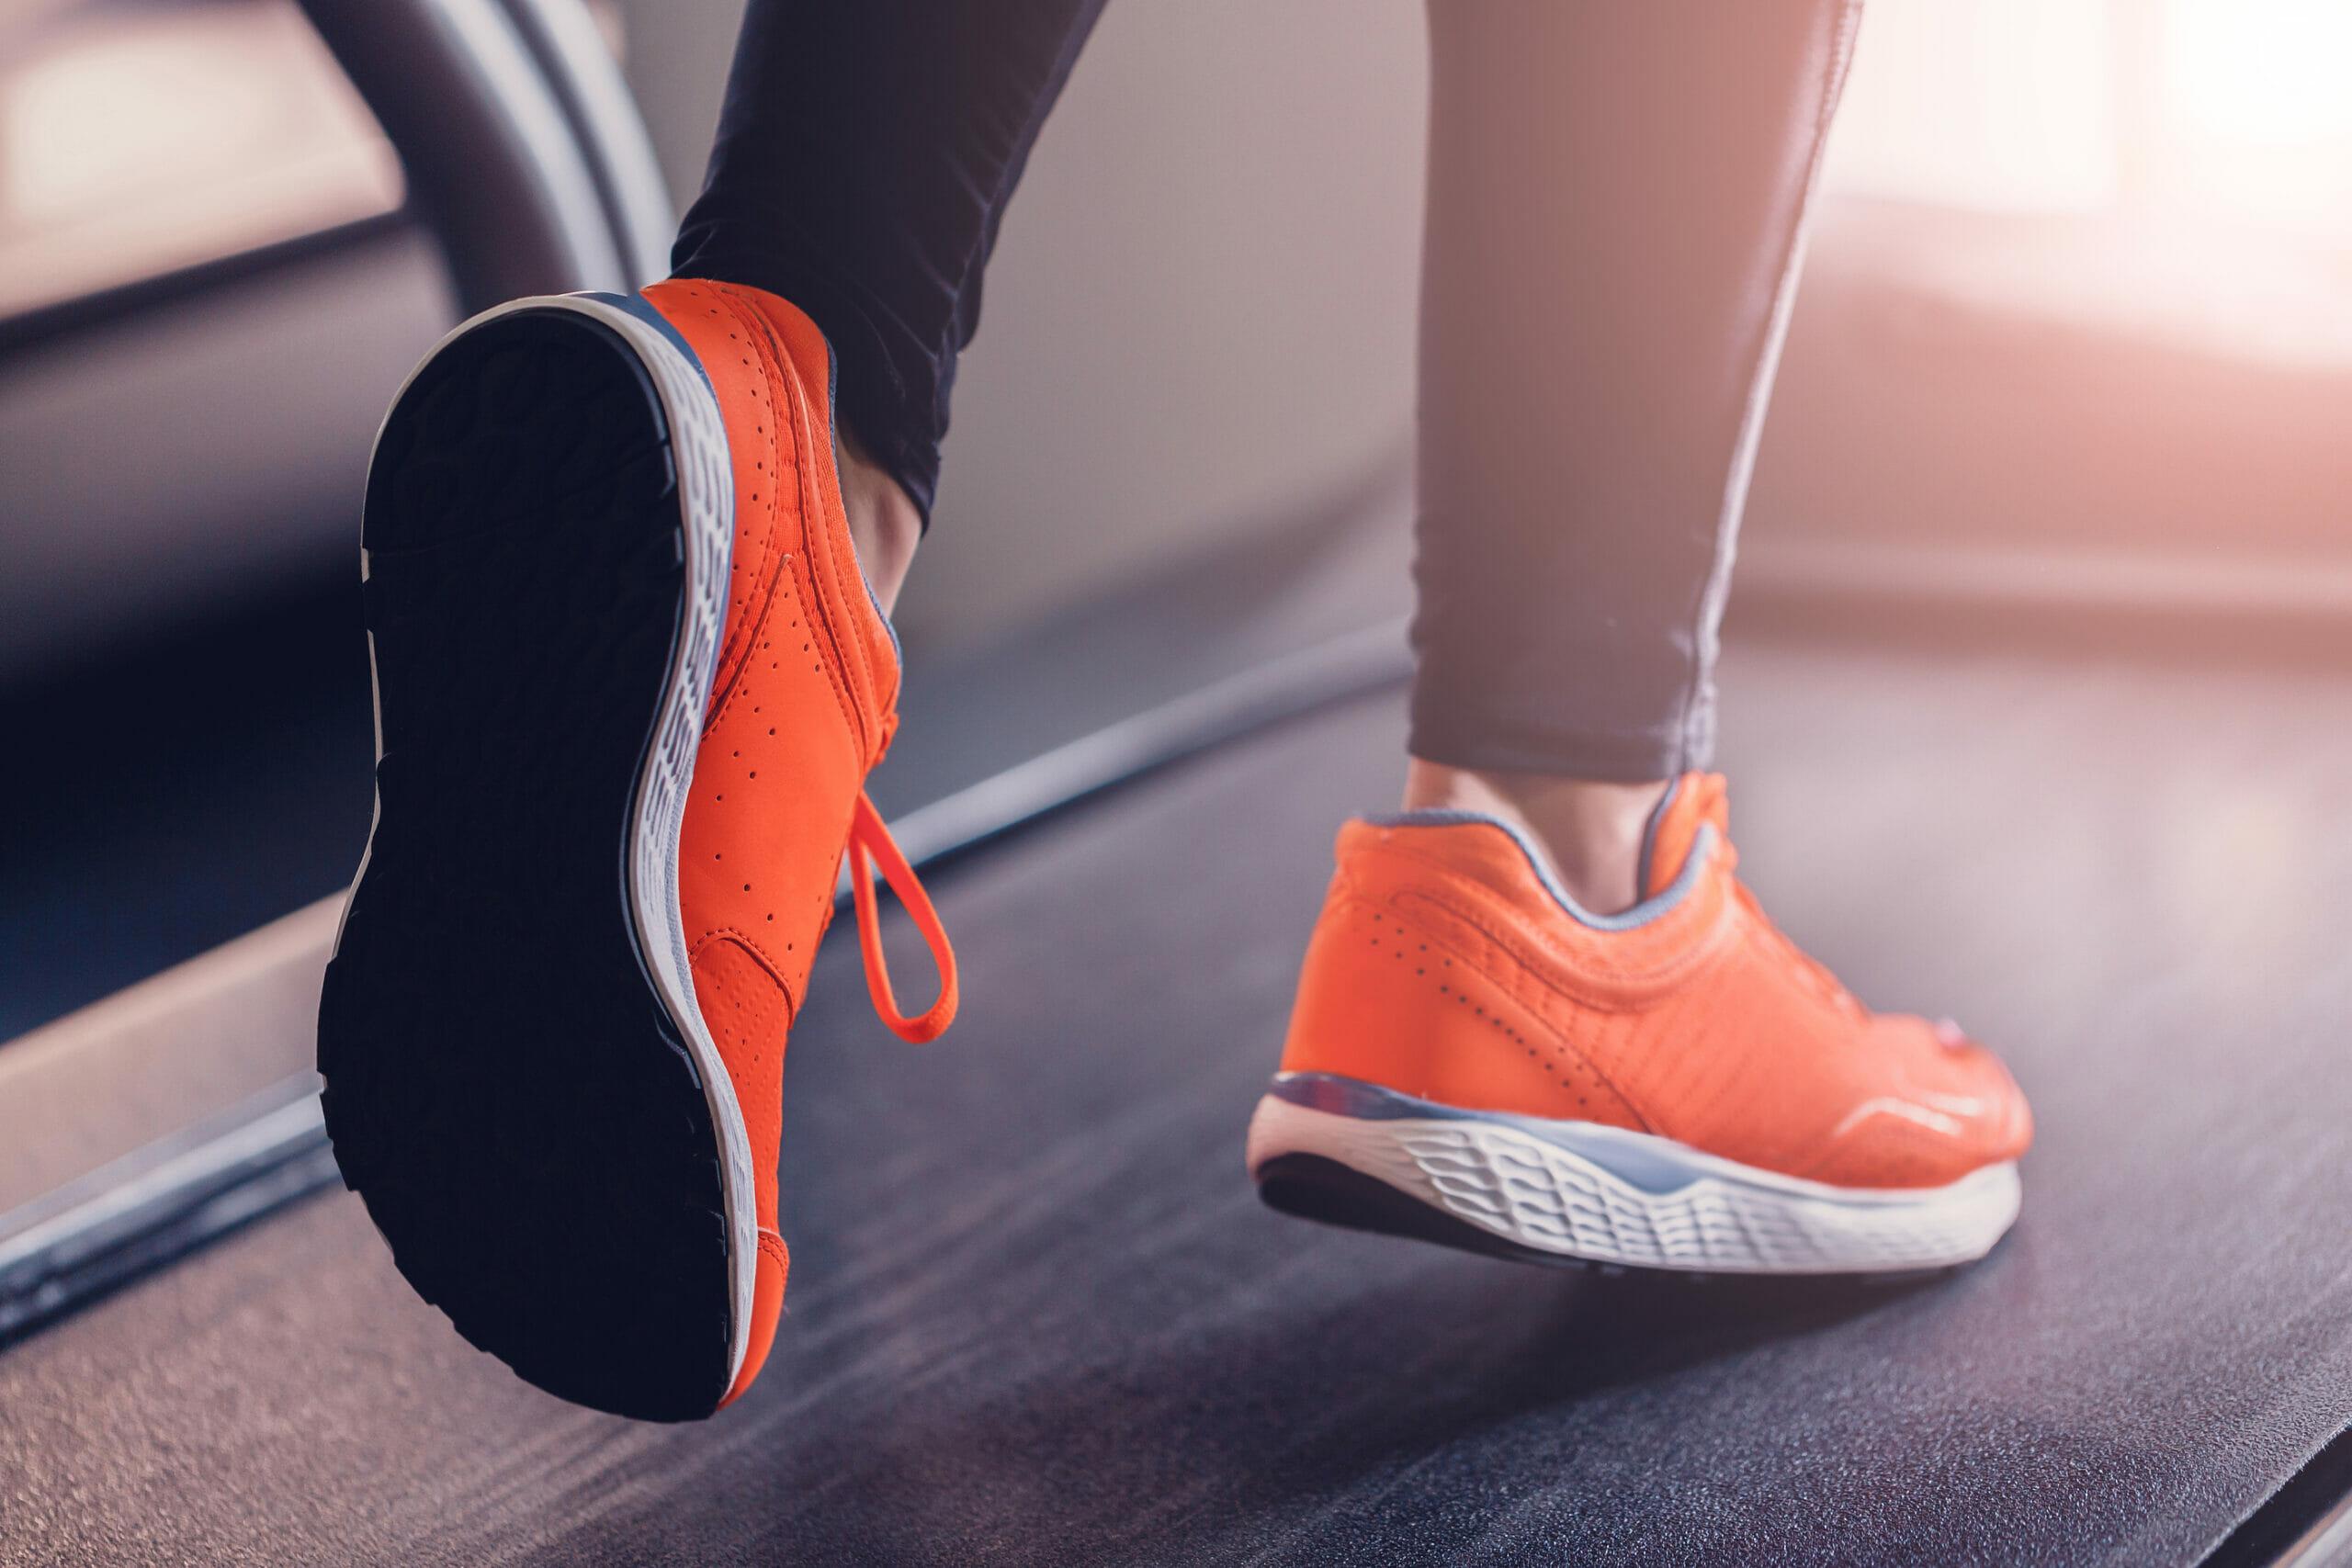 XTERRA TRX2500 treadmill review